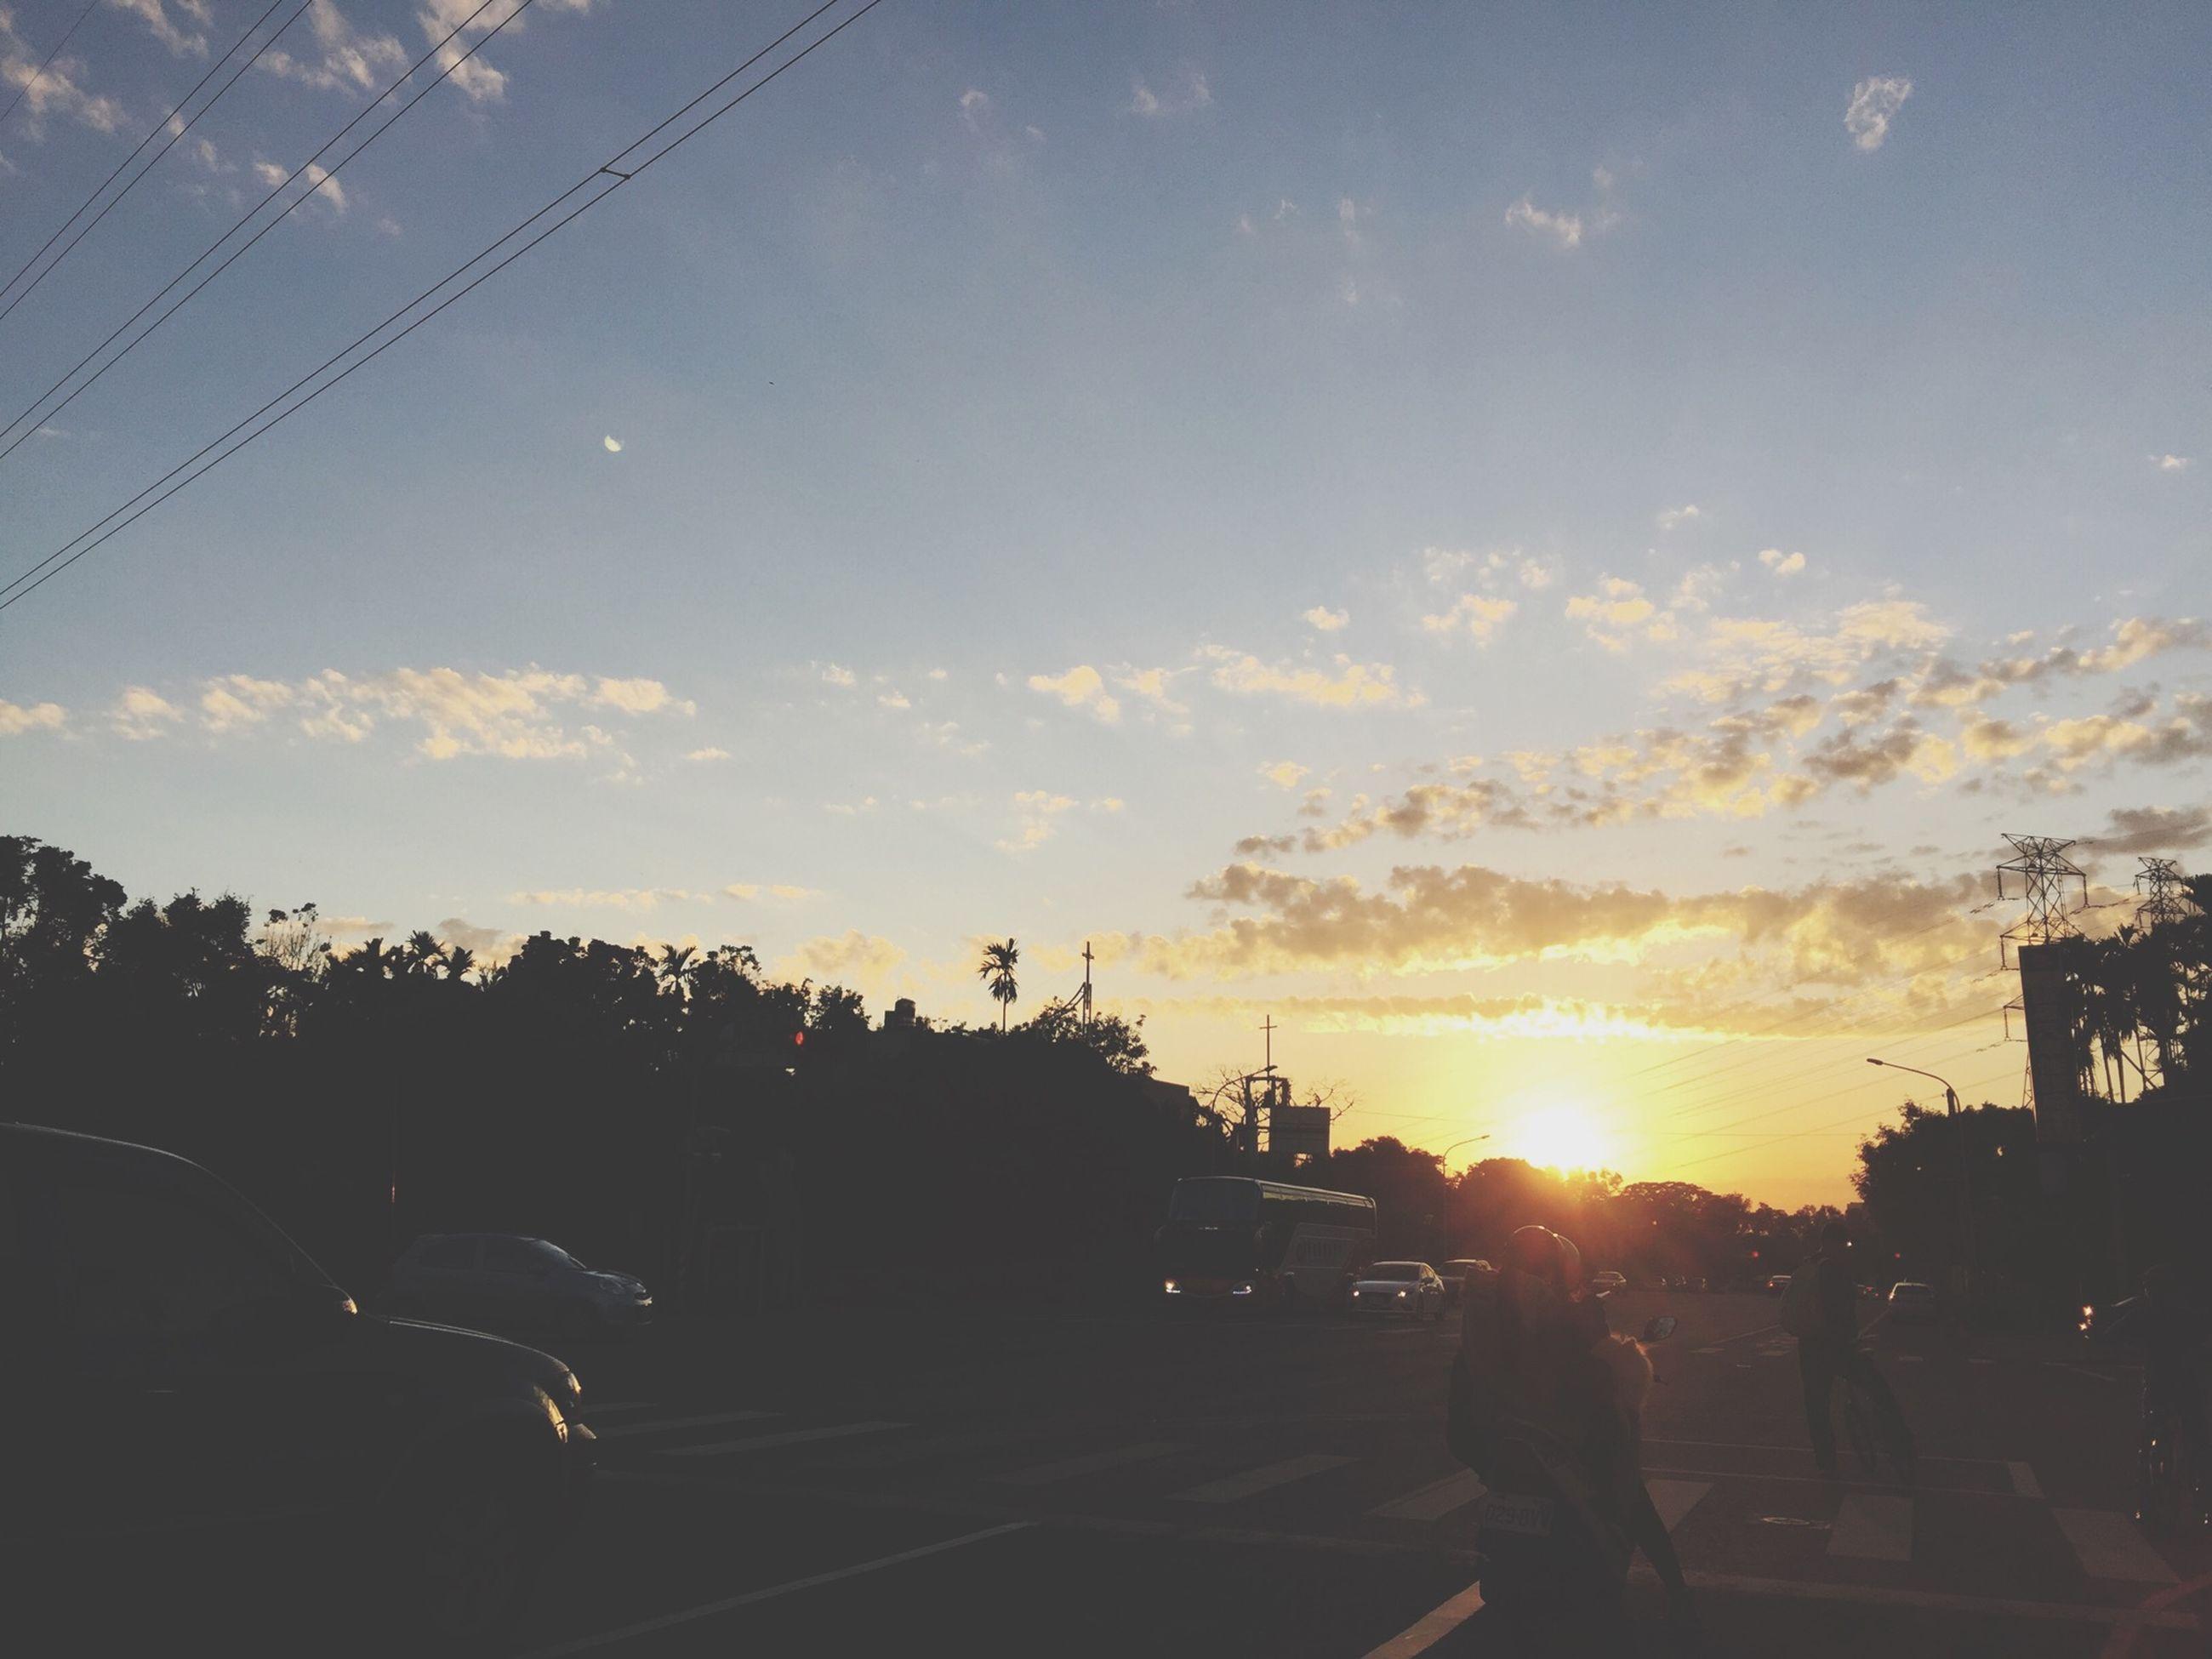 sunset, sky, transportation, car, land vehicle, sun, silhouette, mode of transport, street, cloud - sky, sunlight, tree, road, city, outdoors, building exterior, large group of people, sunbeam, nature